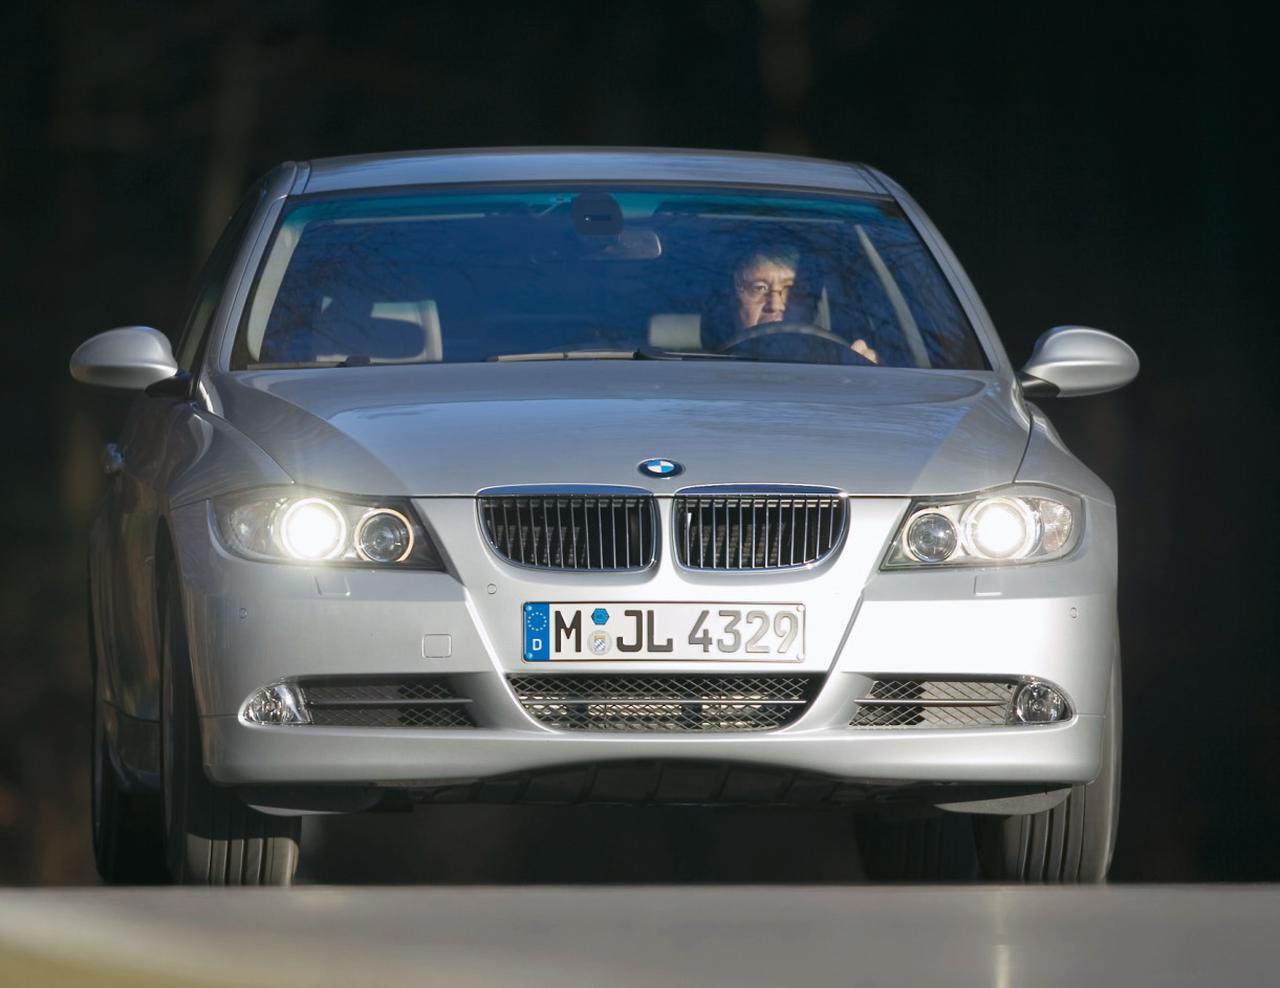 Images : 8番目の画像 - BMW 330xiと330d - Webモーターマガジン